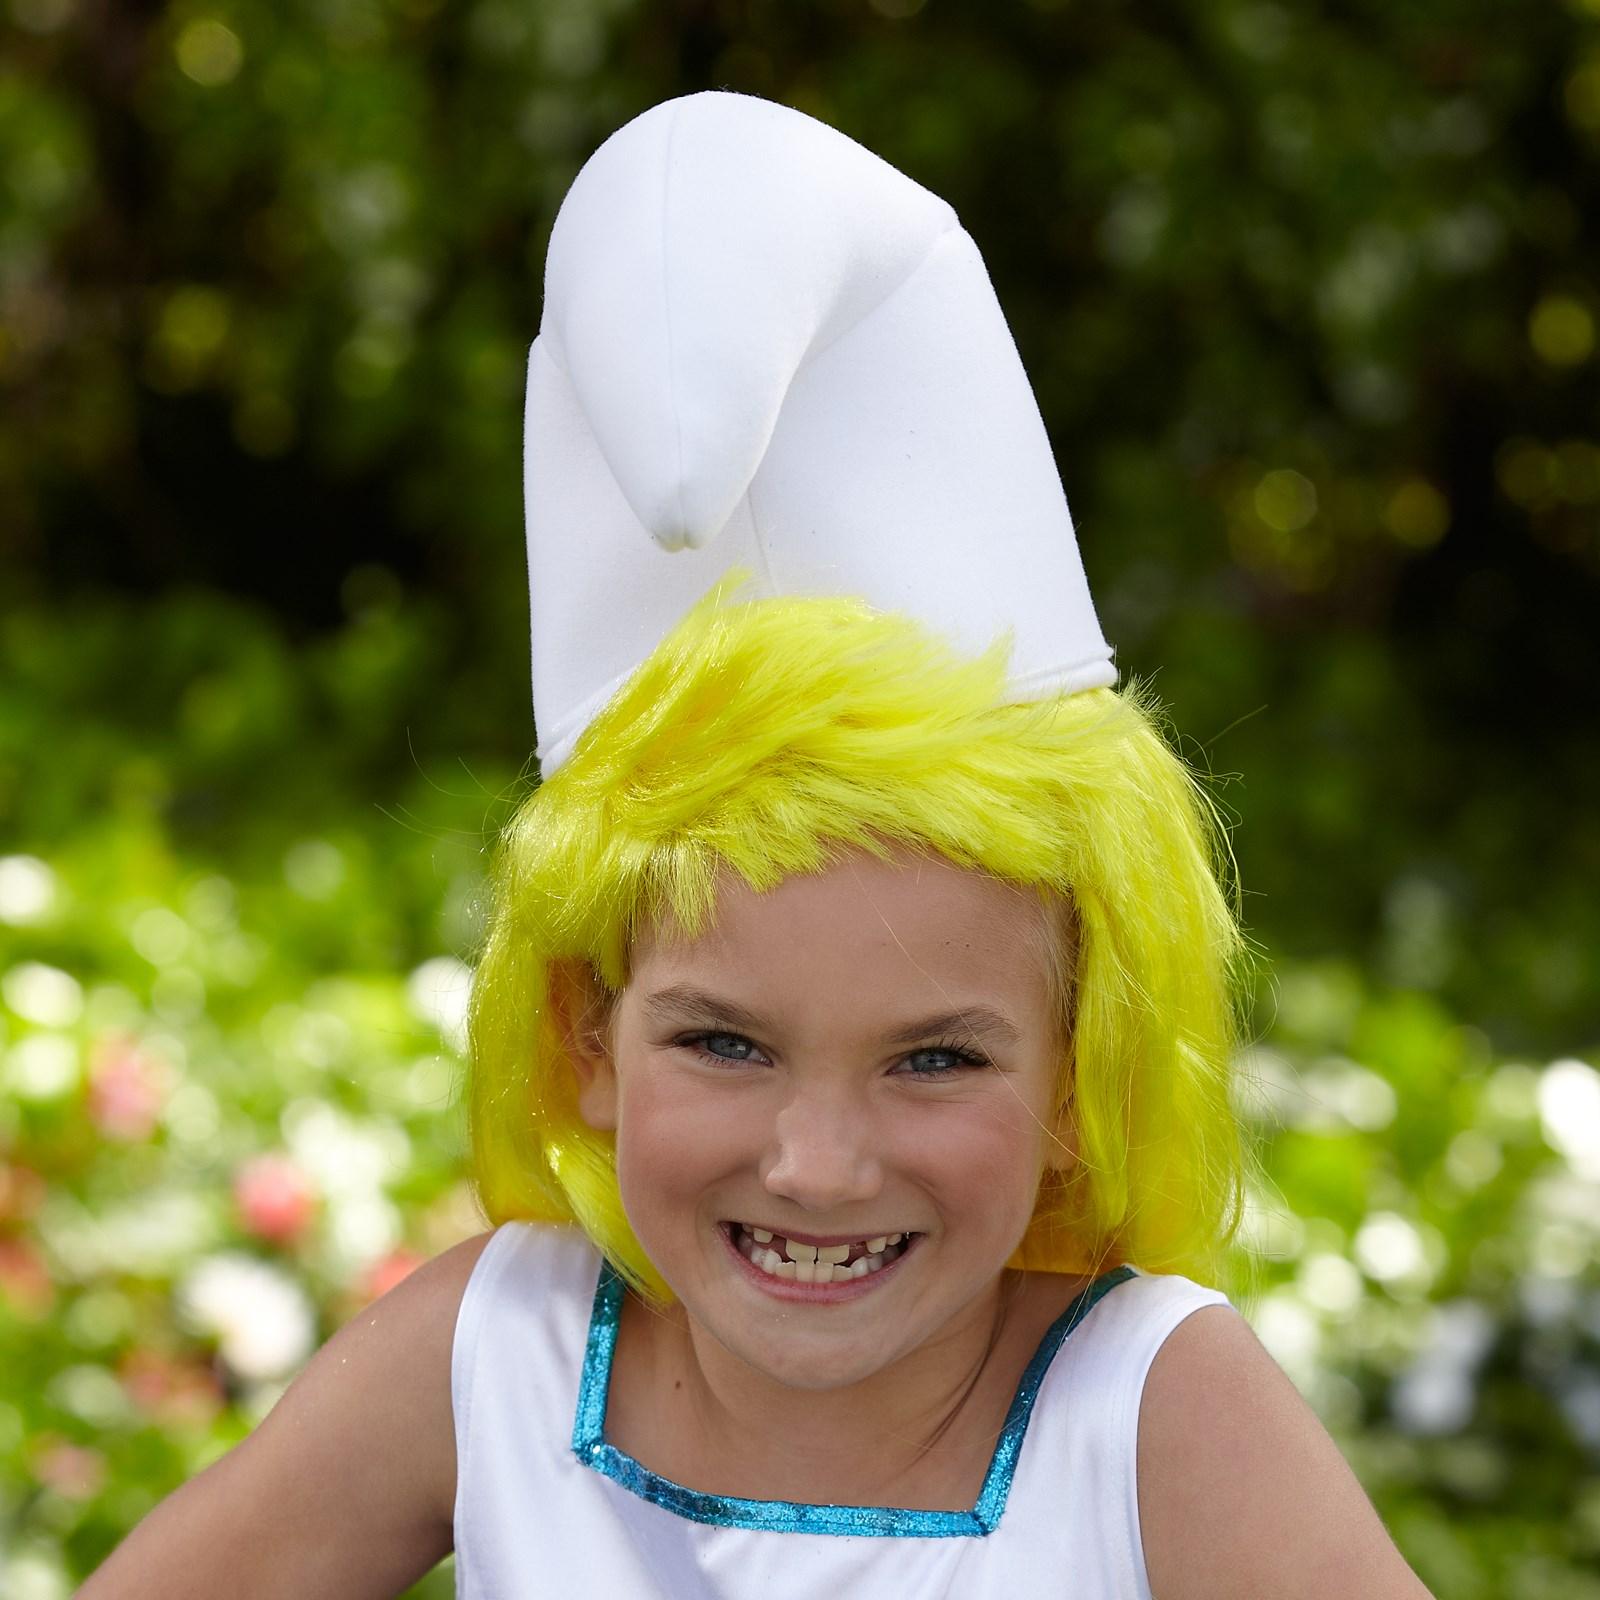 The Smurfs - Smurf Dress Child Costume | BuyCostumes.com